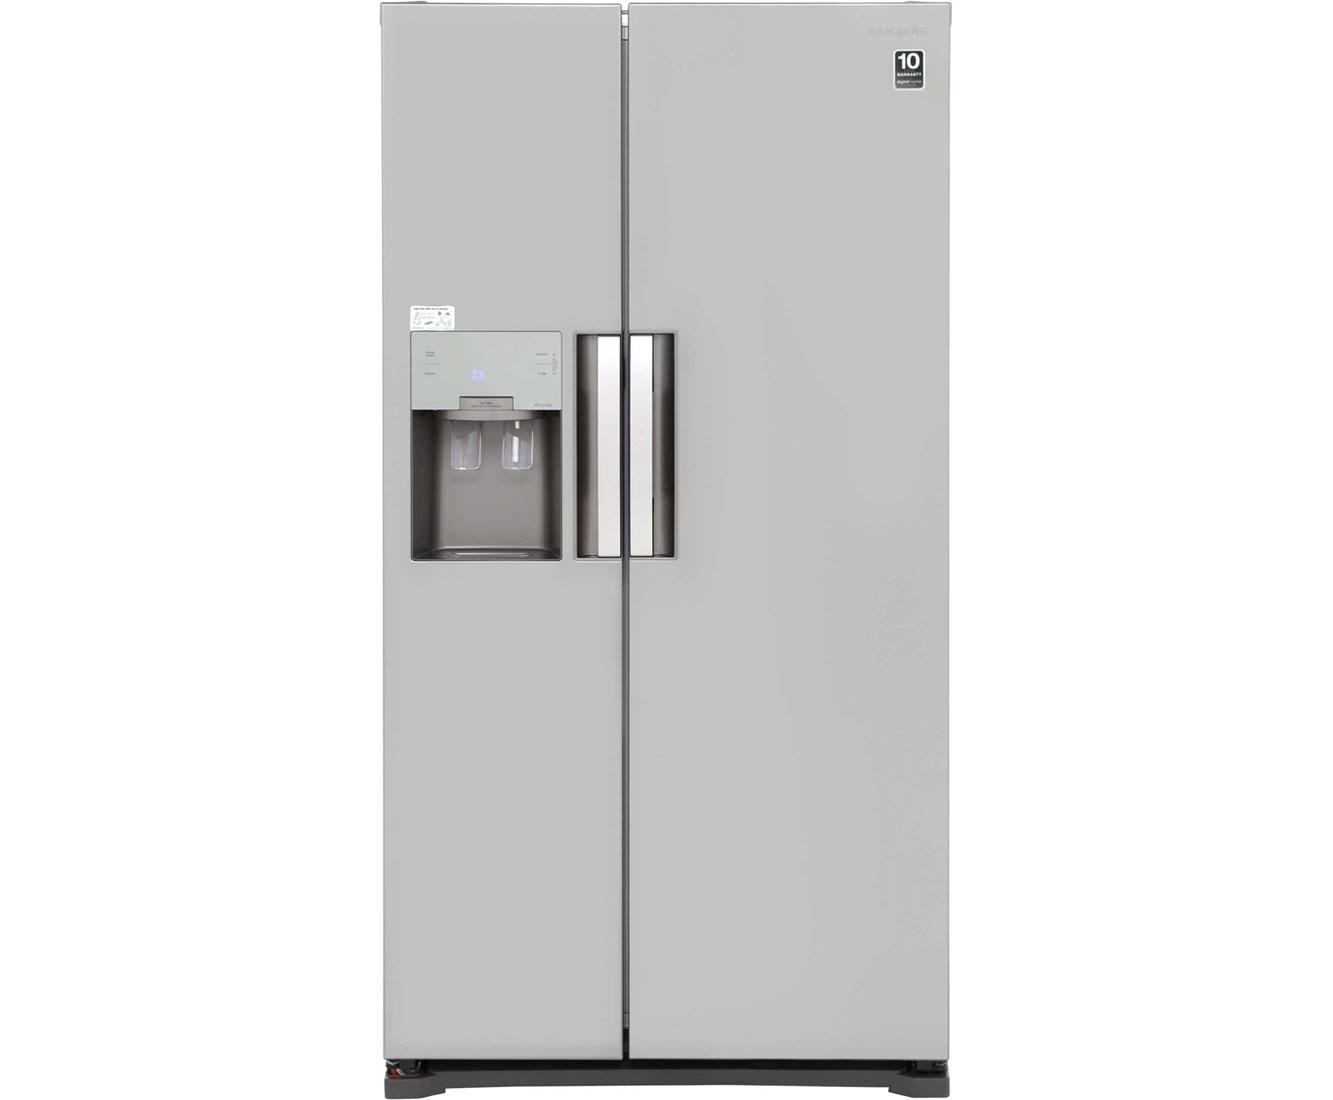 Samsung HSeries RS7667FHCSP Free Standing American Fridge Freezer in Platinum Inox